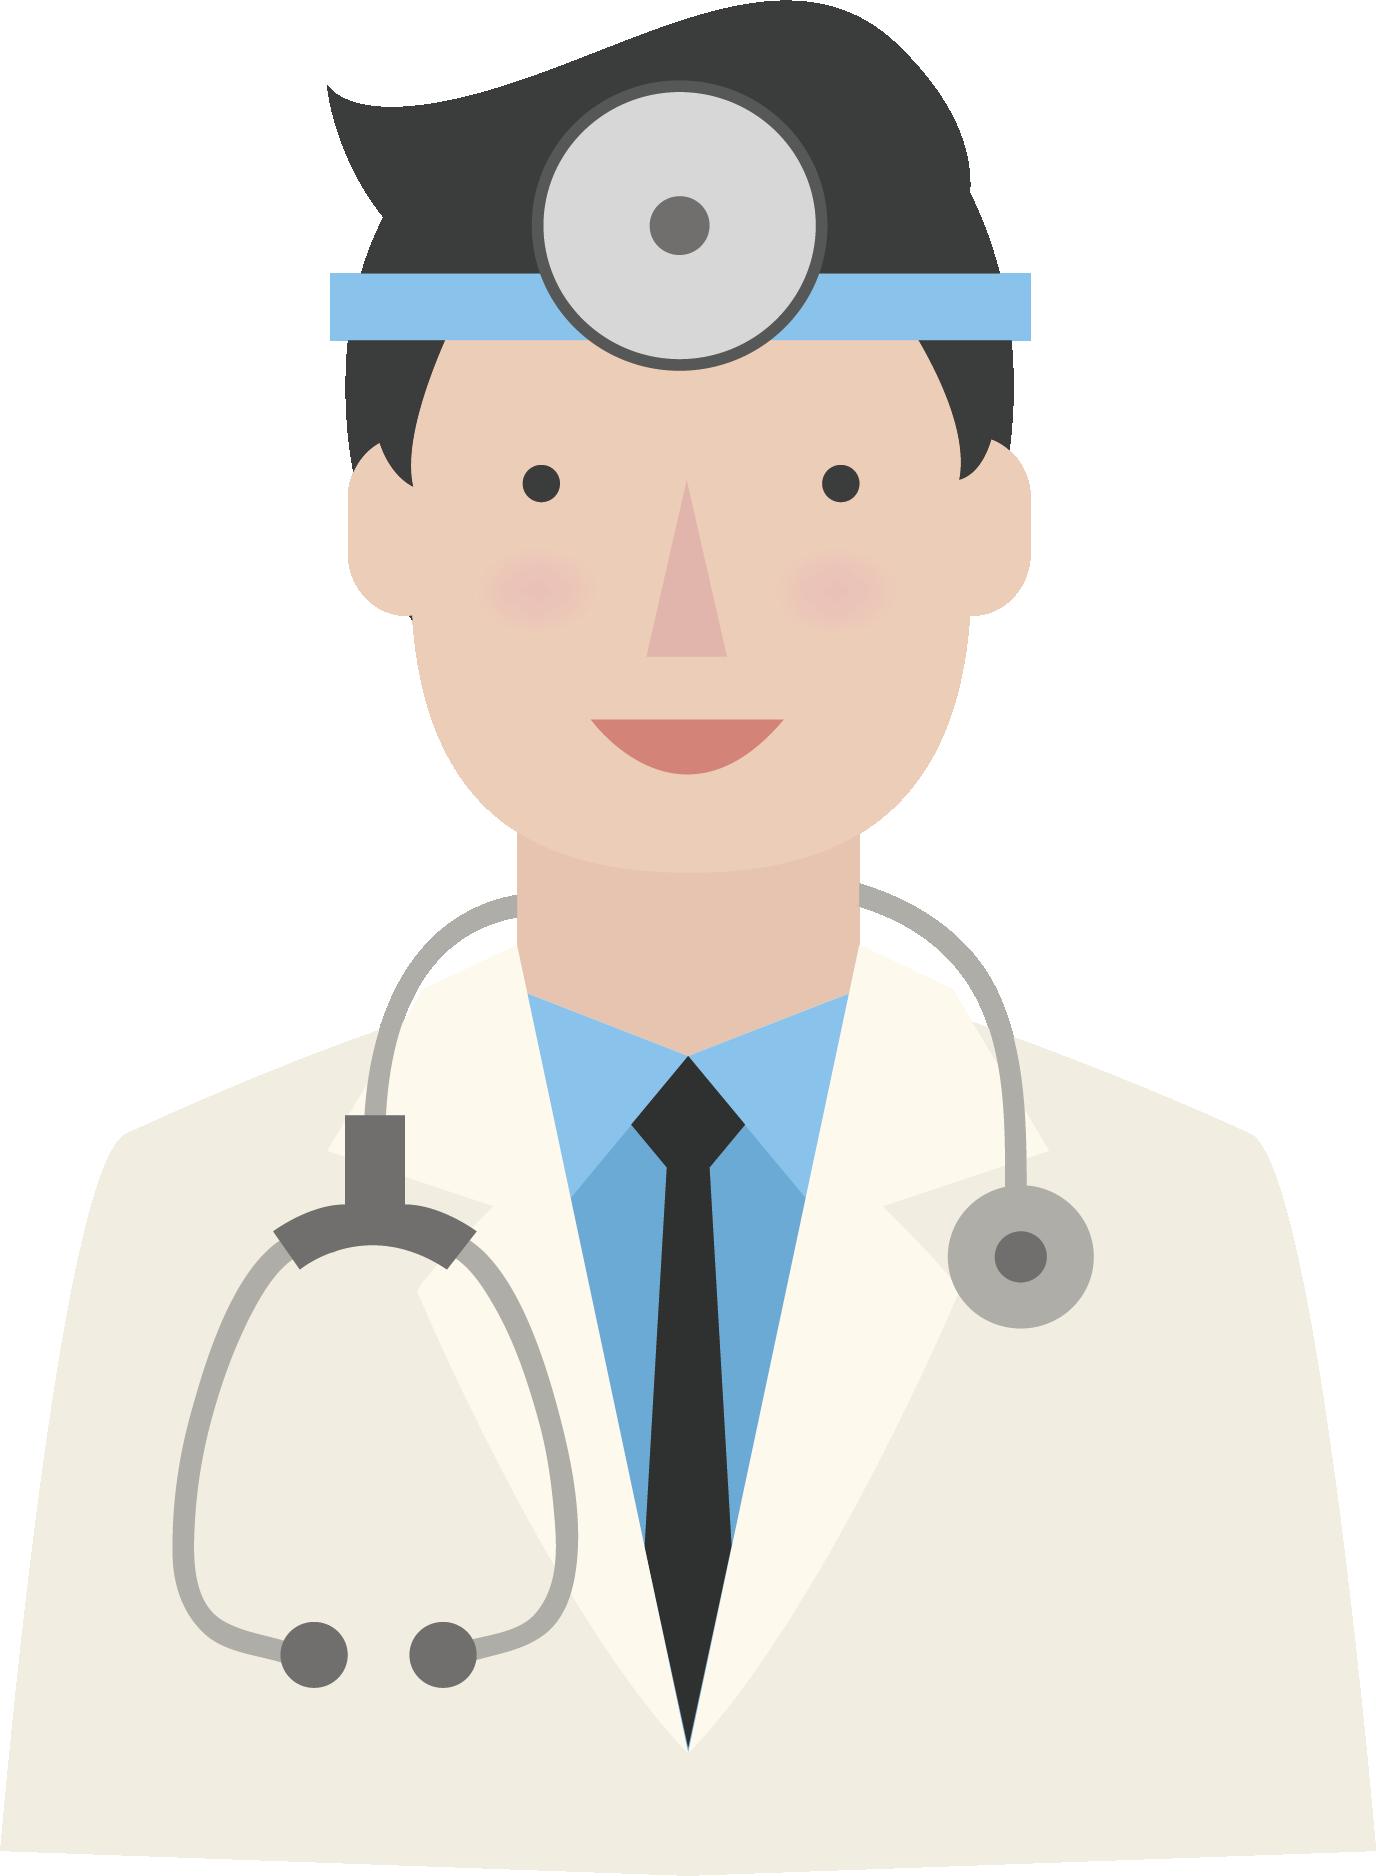 Engineering clipart biomedical engineer. Physician medicine cartoon doctor